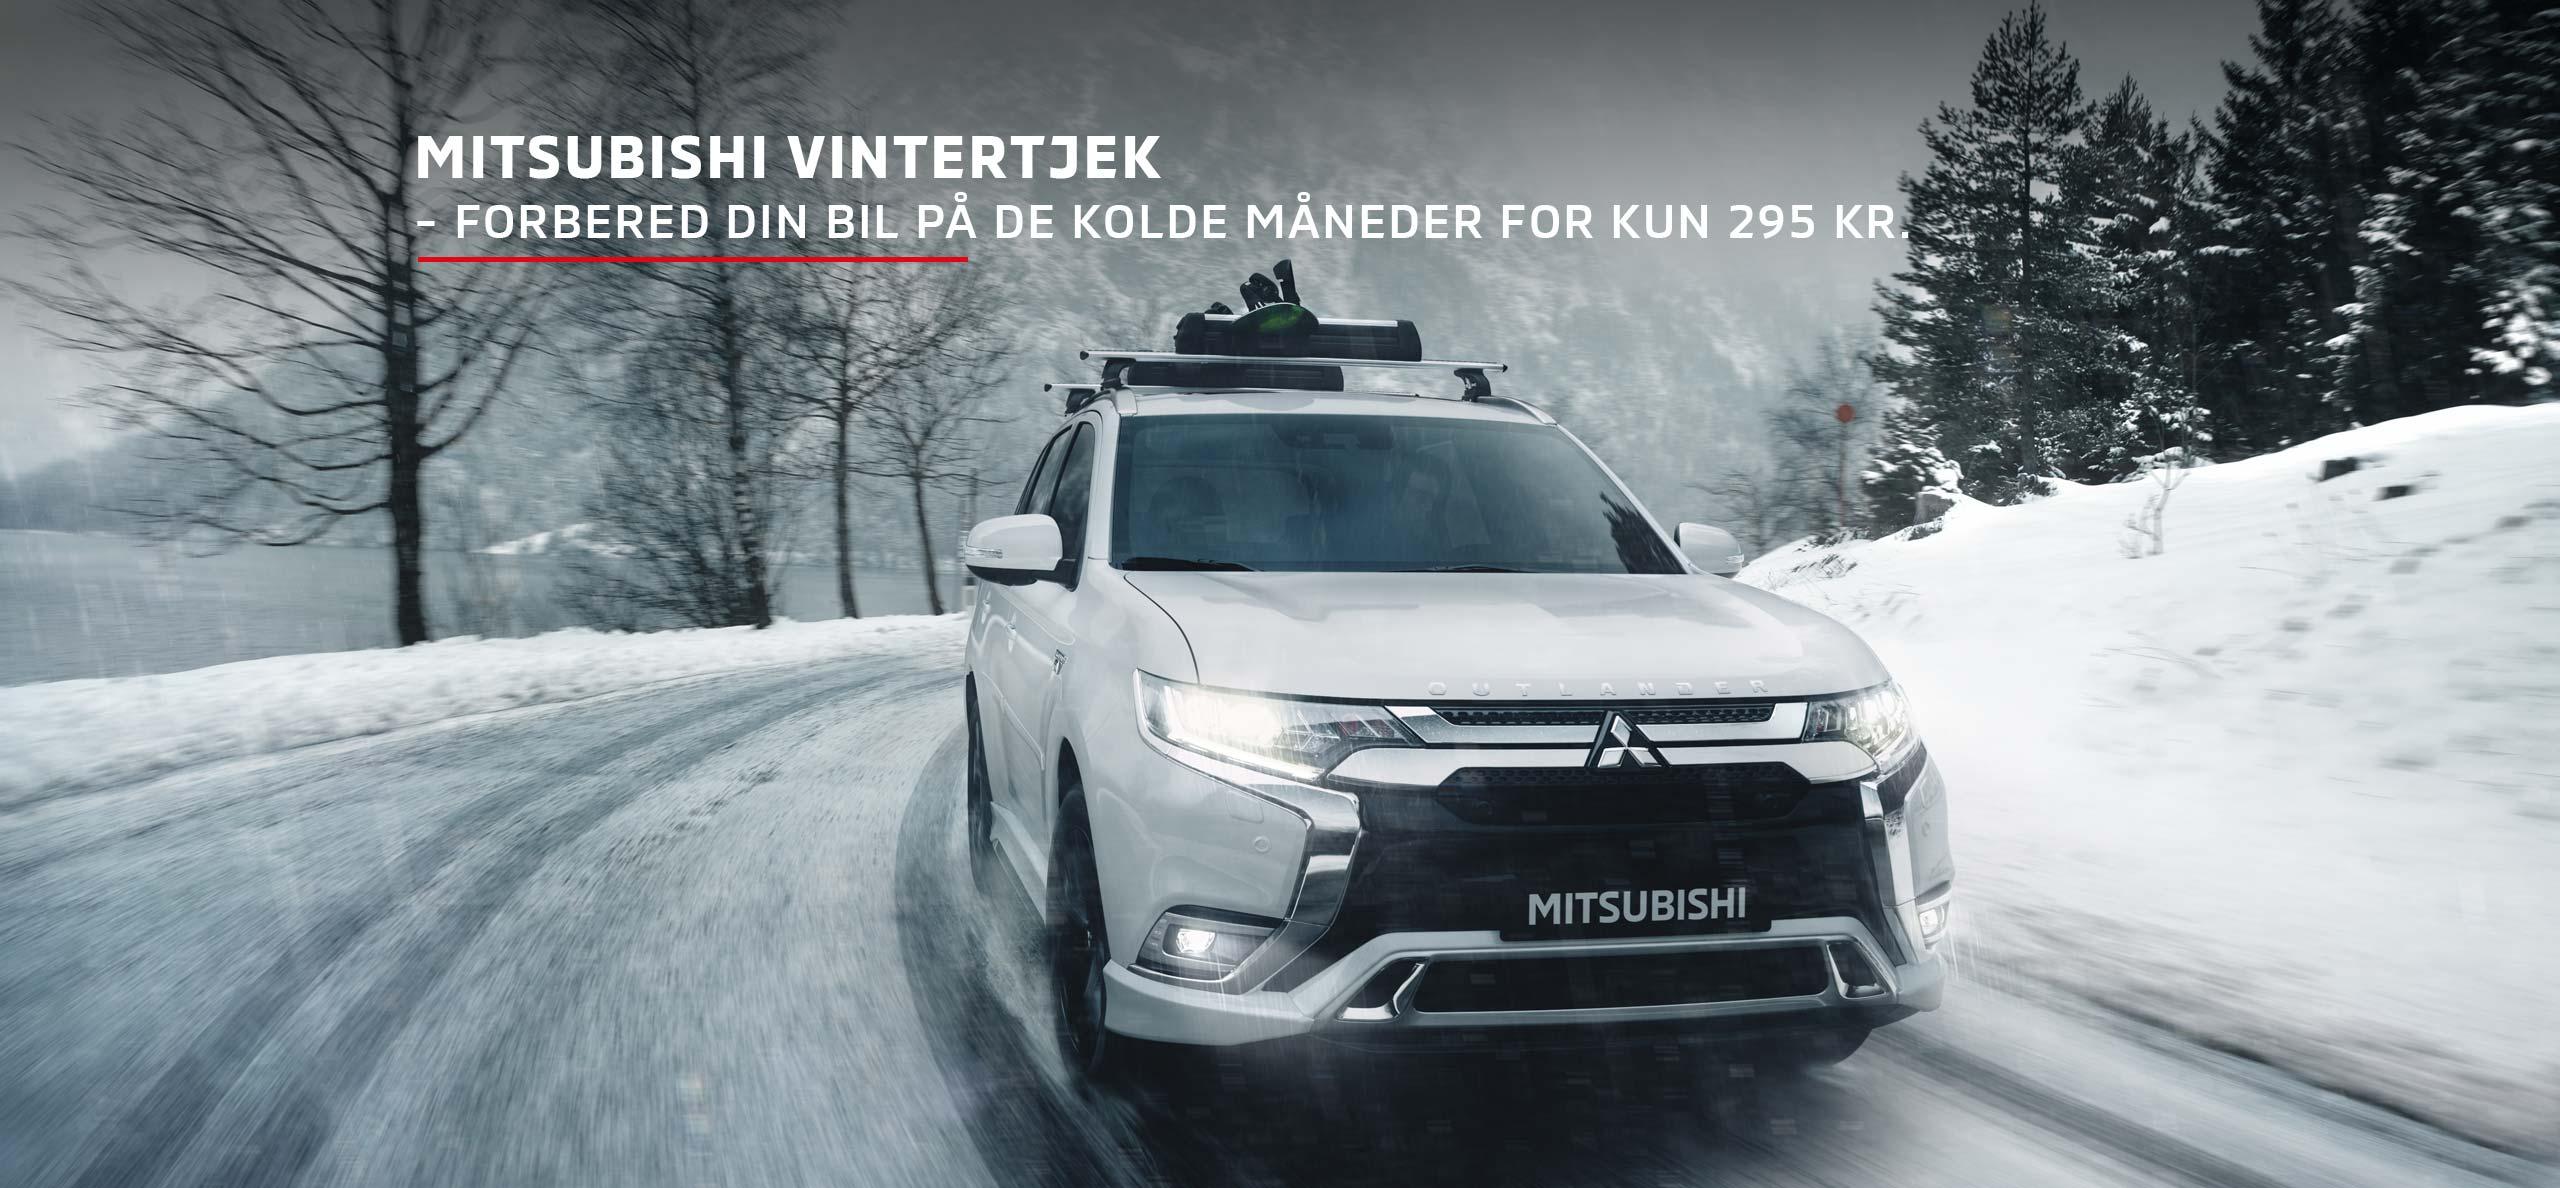 Giv din Mitsubishi et vintertjek